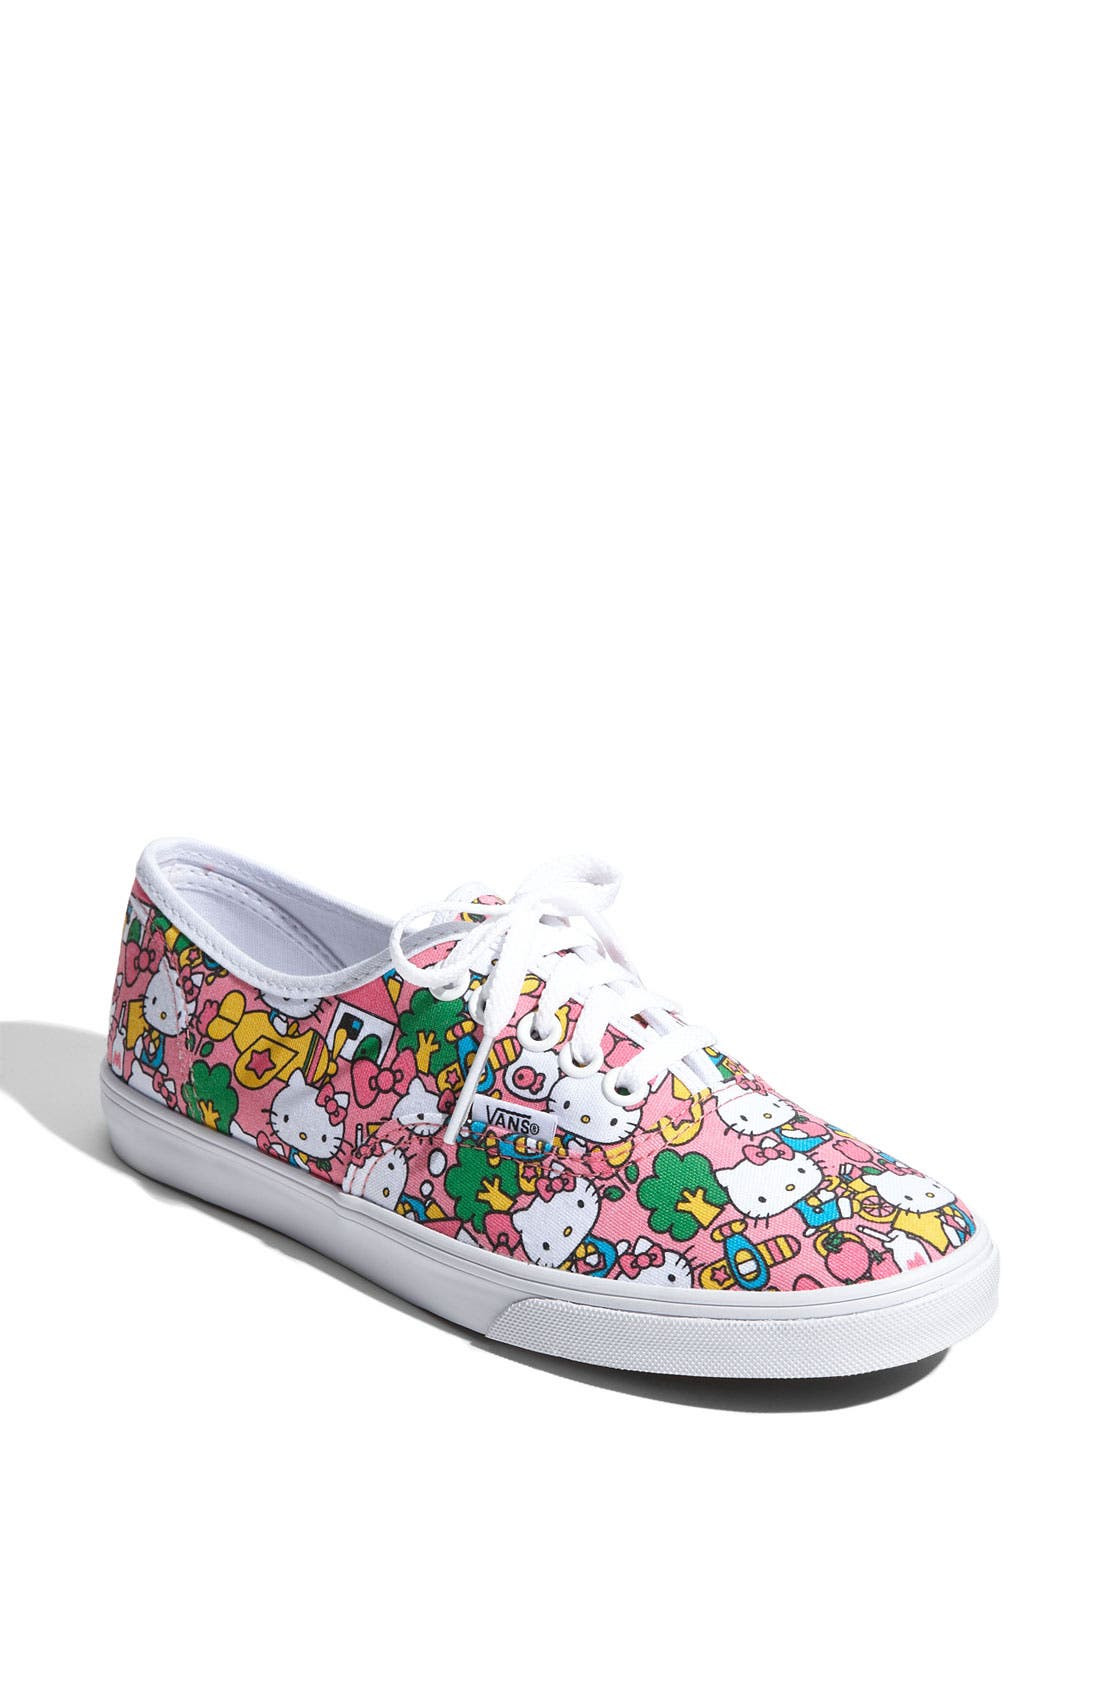 Main Image - Vans 'Lo Pro - Hello Kitty®' Sneaker (Women) (Limited Edition)